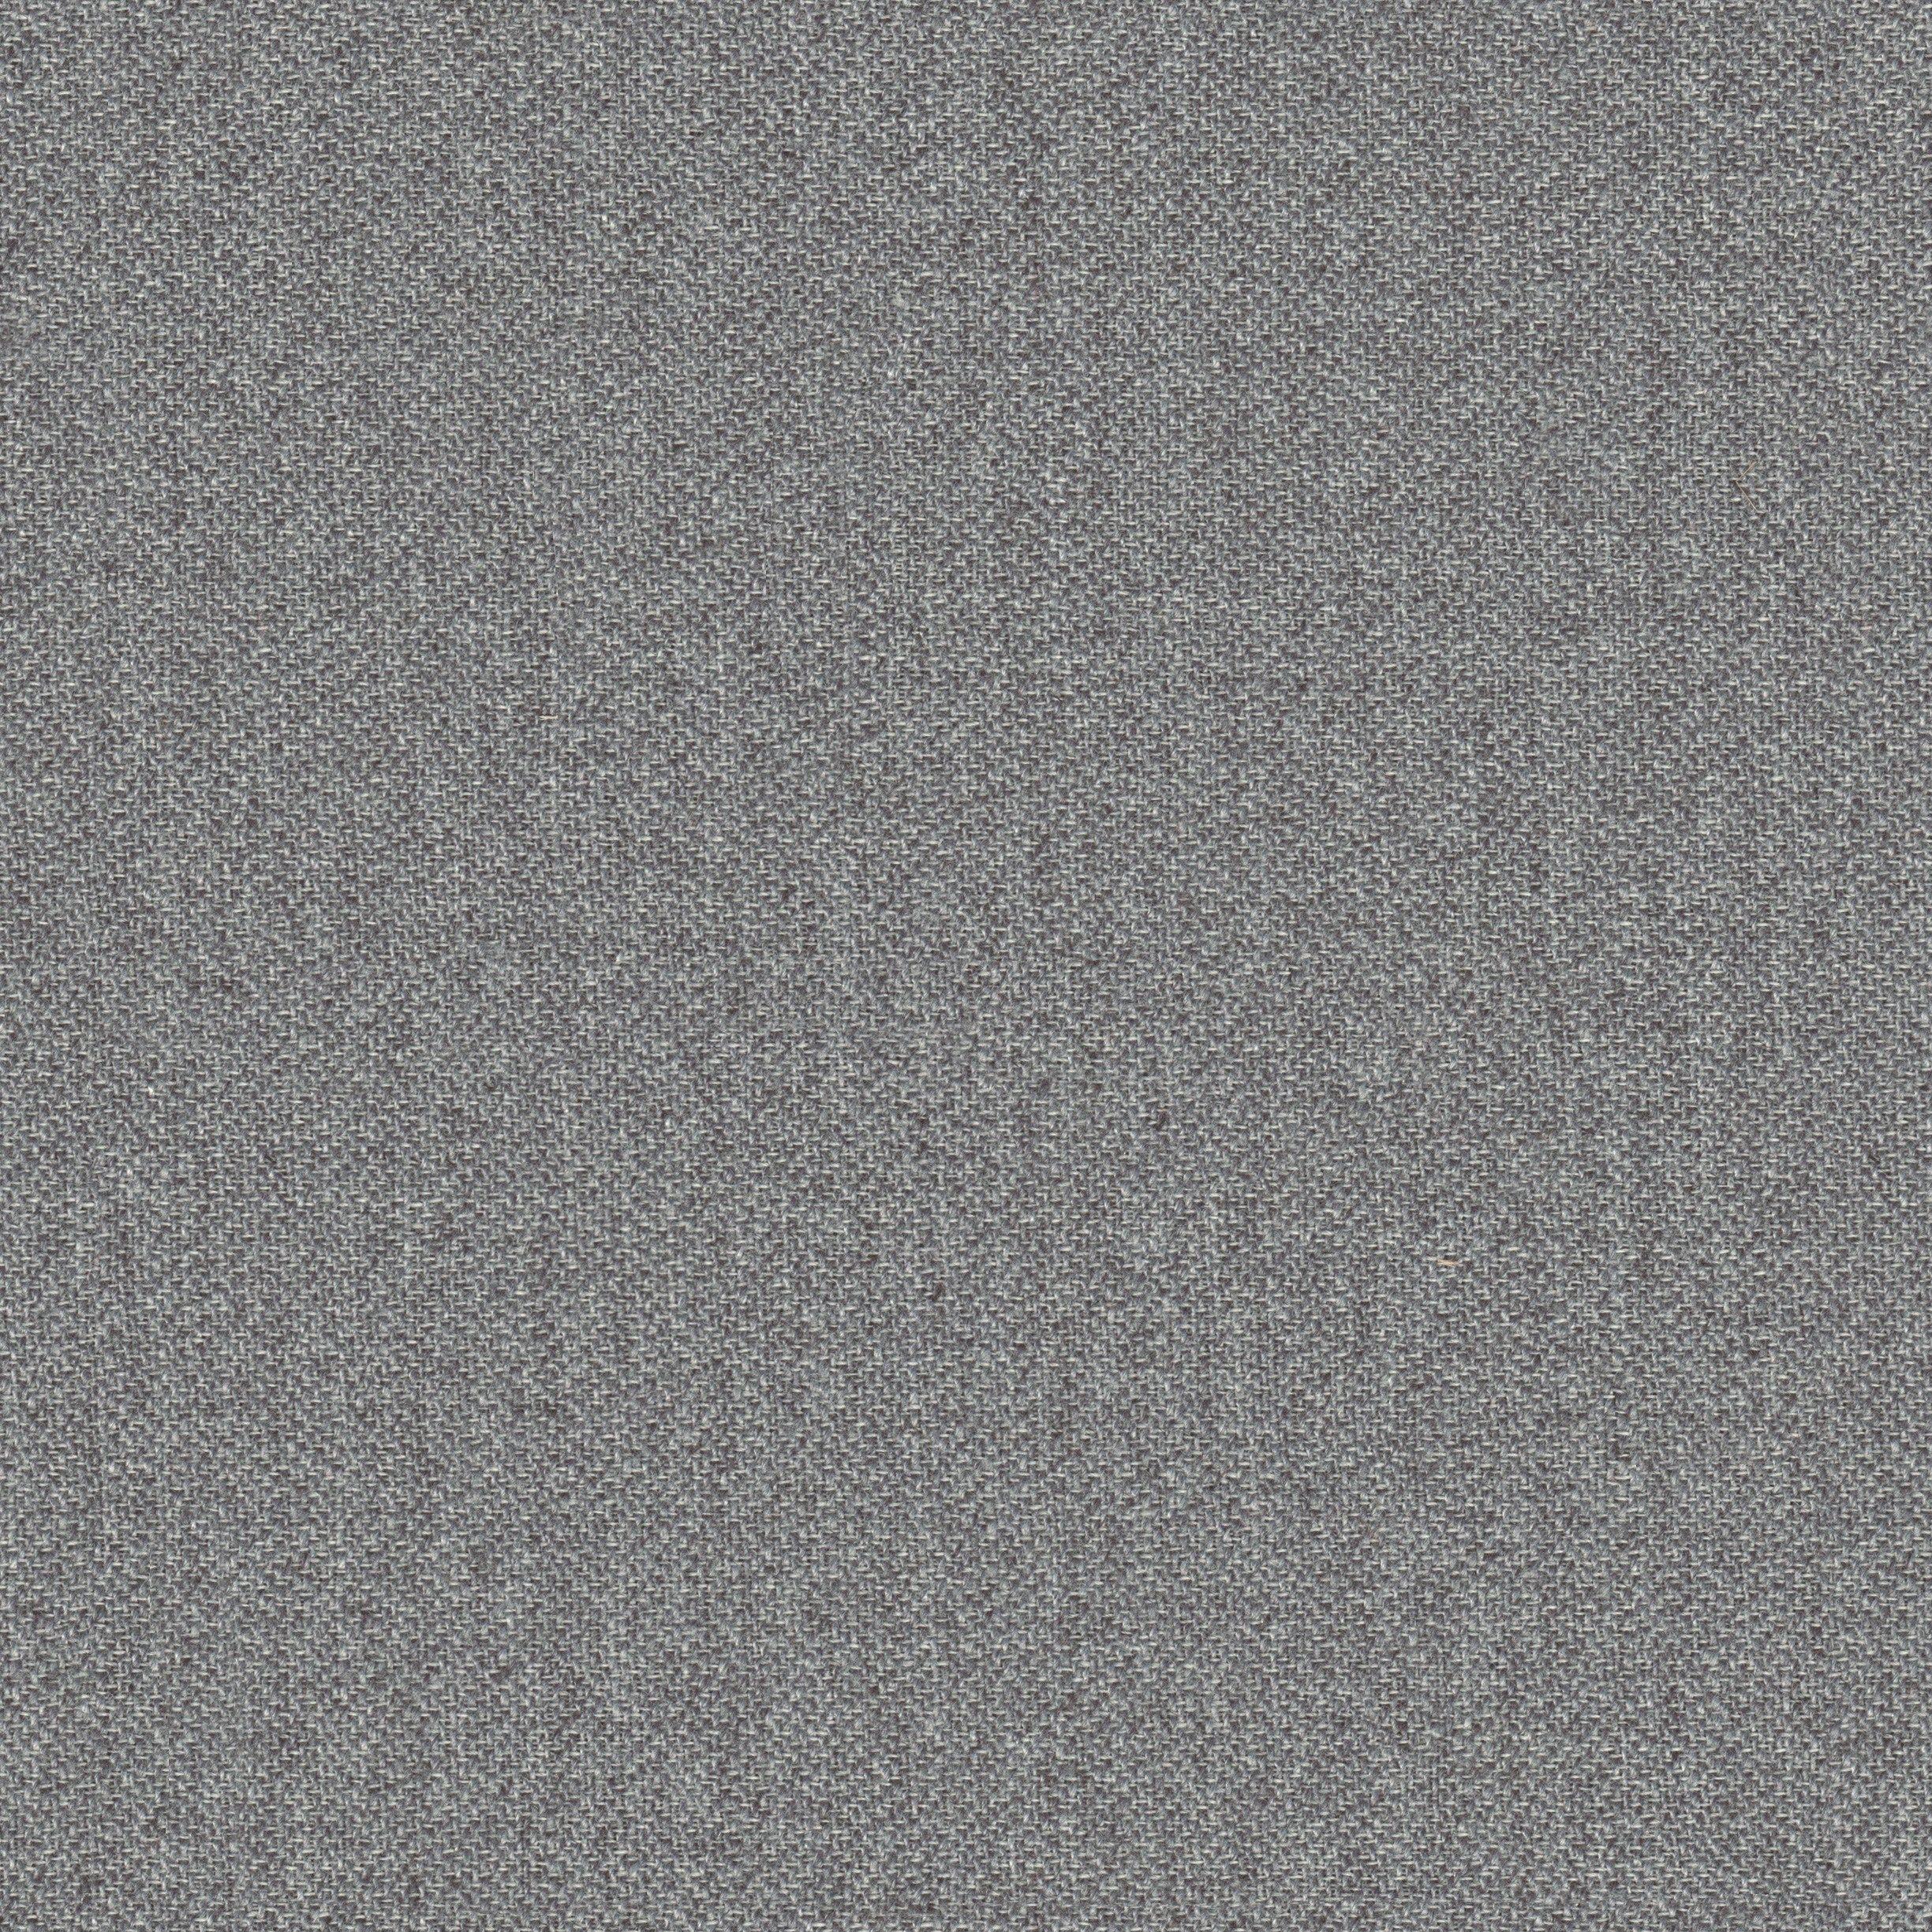 Free Tweed Zigzag Carpet Seamless Texture Free Tiling Textures